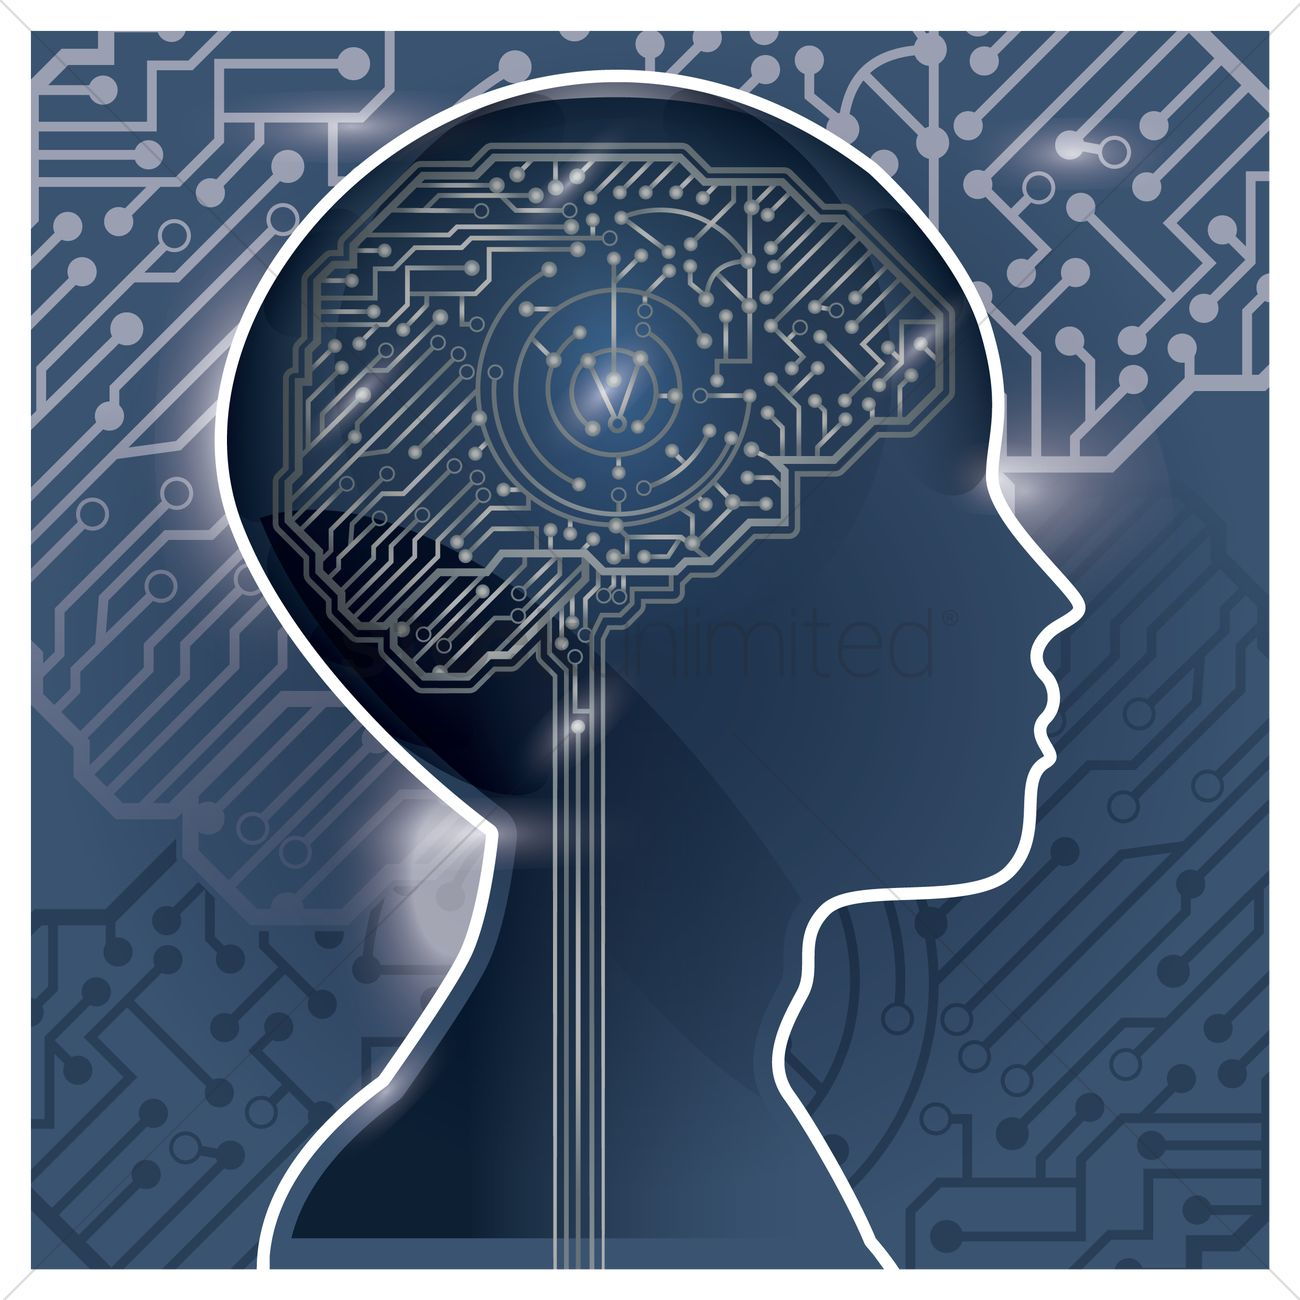 Circuit Brain Reusable : Circuit board human brain design vector image